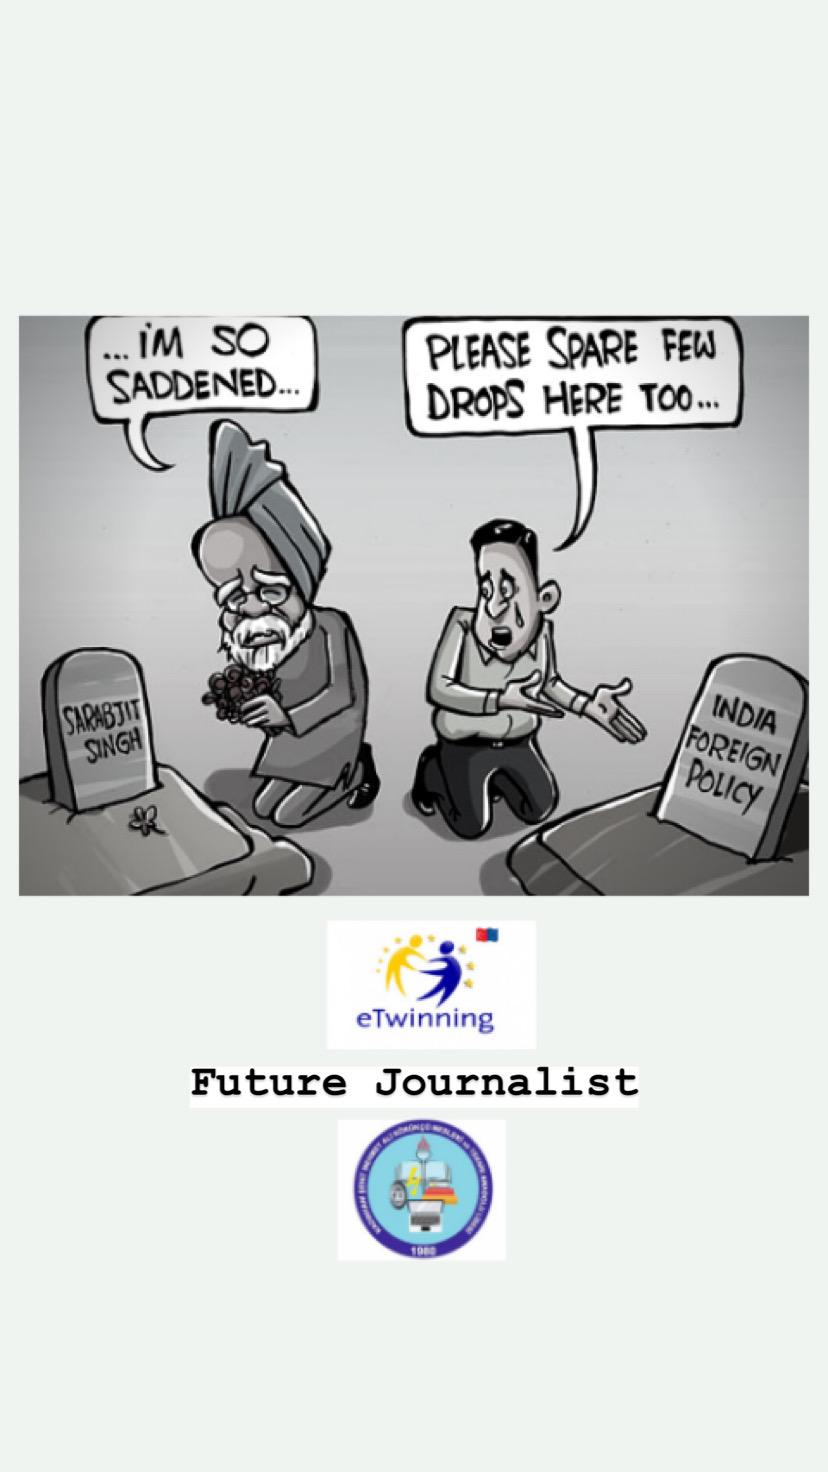 Future Journalists – Just for Fun by LACRIMIOARA SABAREANU - Ourboox.com